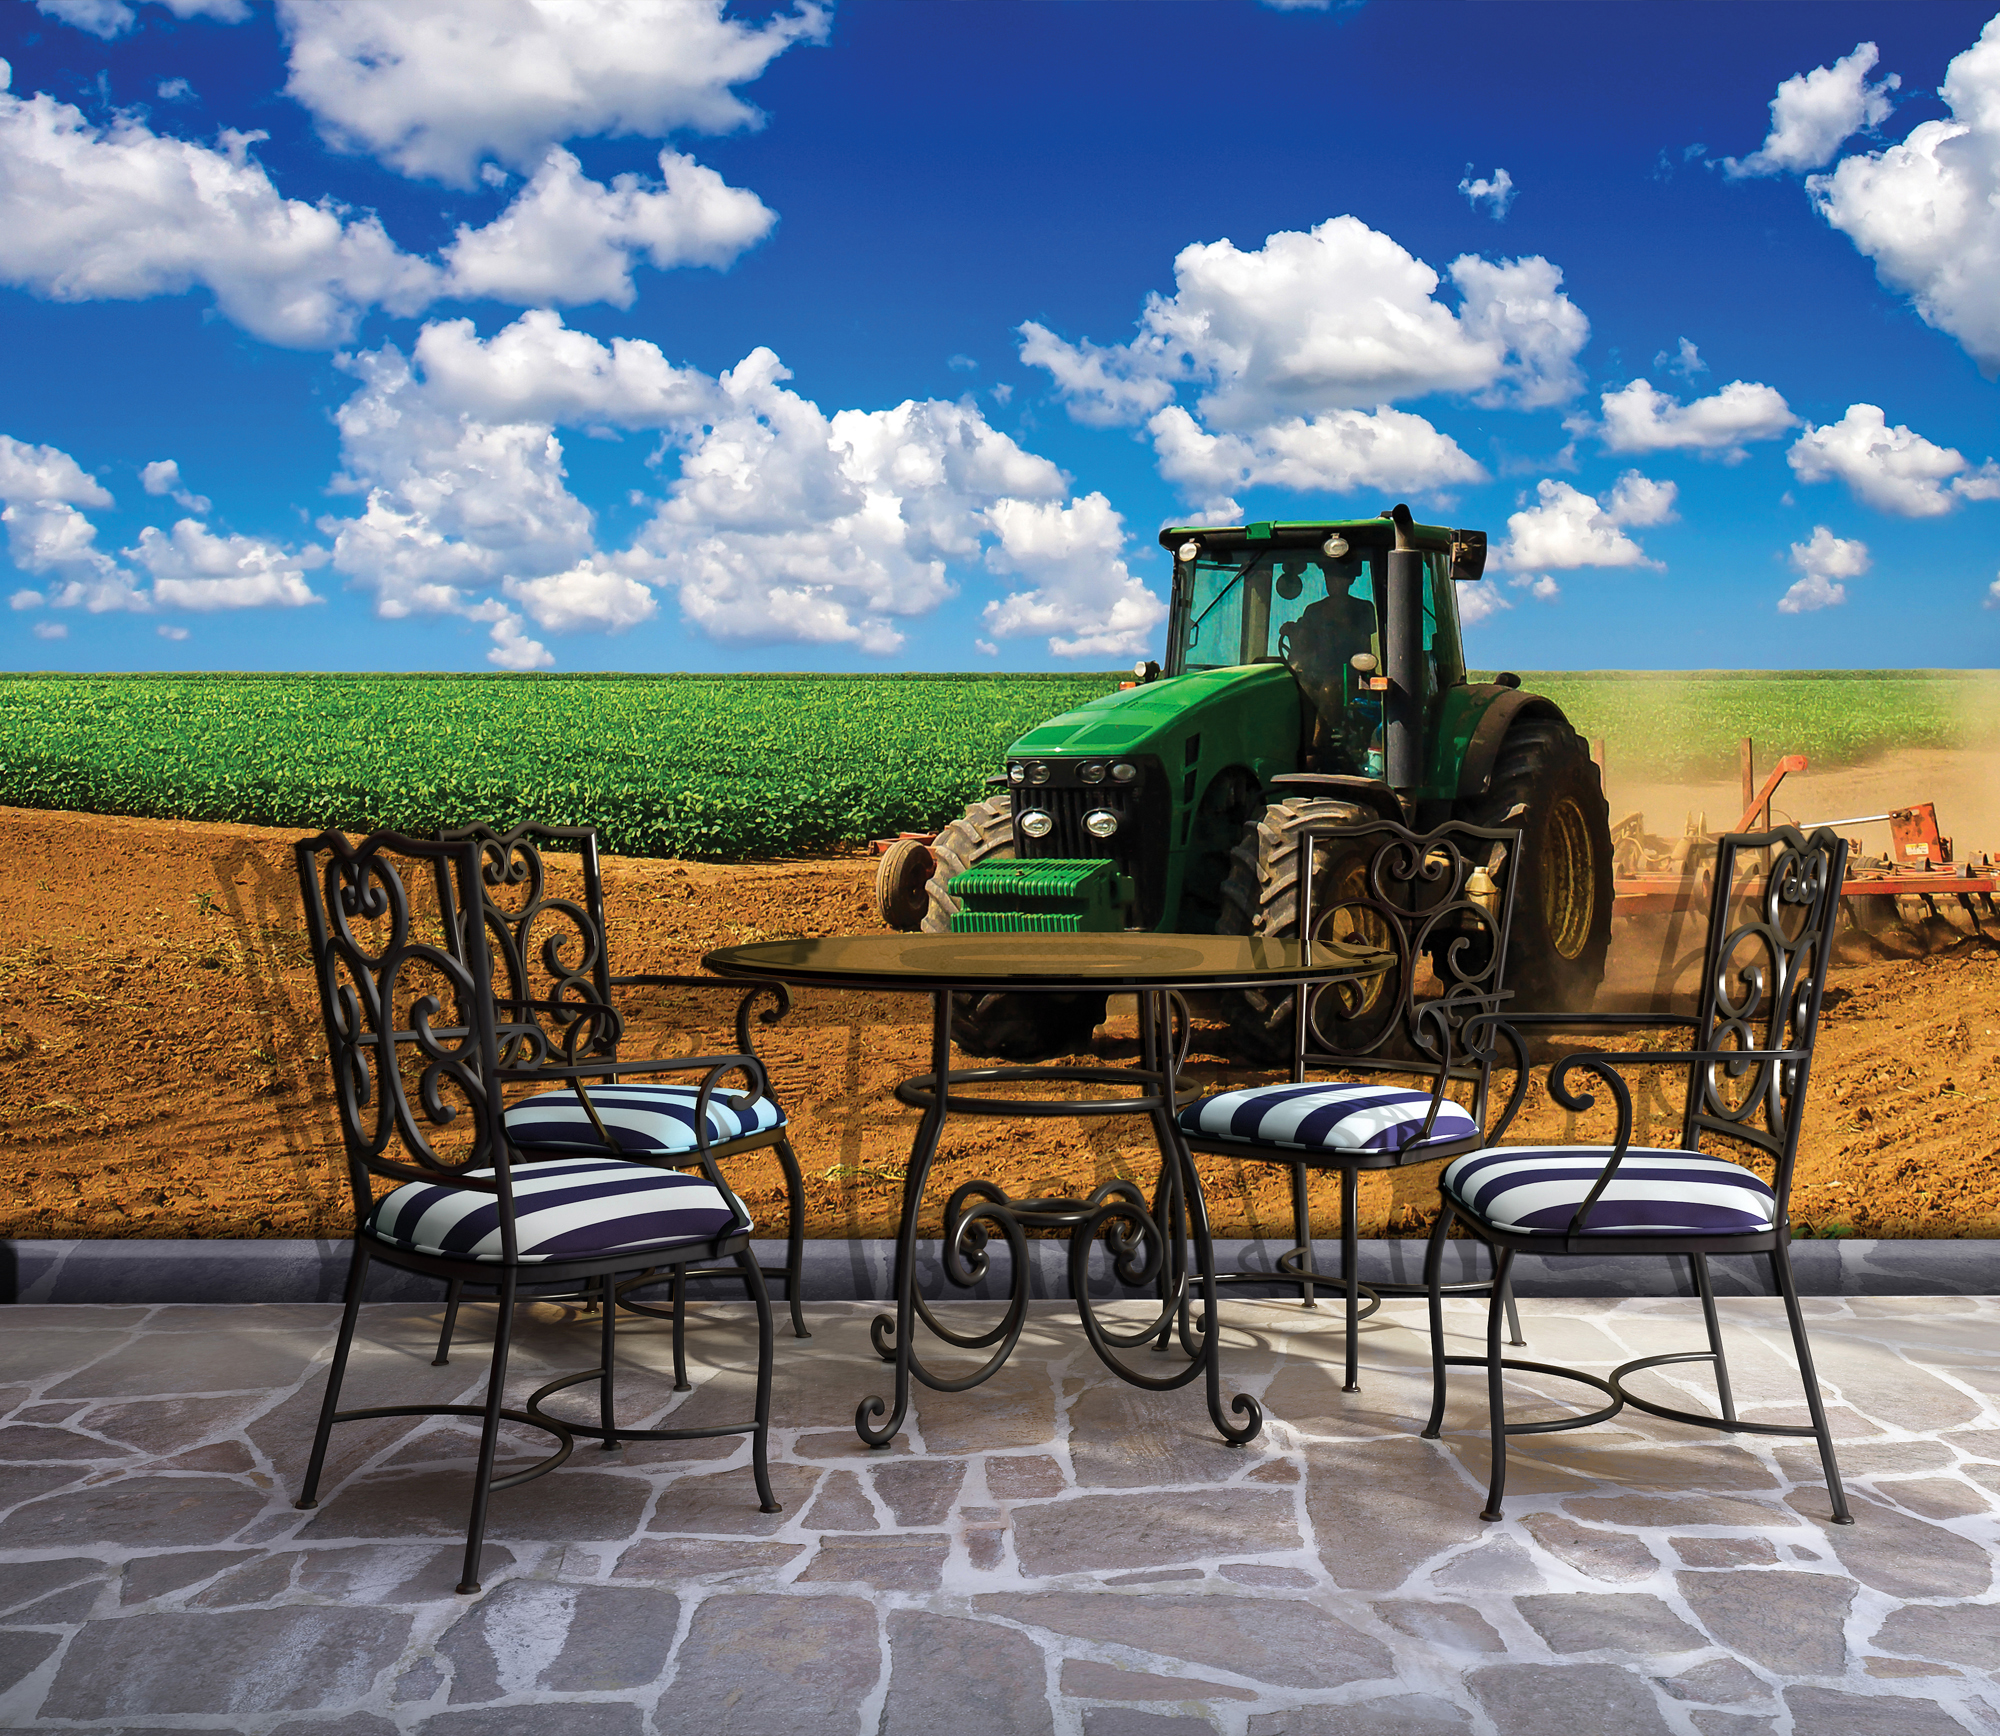 Romantic aged Italian village outdoor furniture on stucco wall